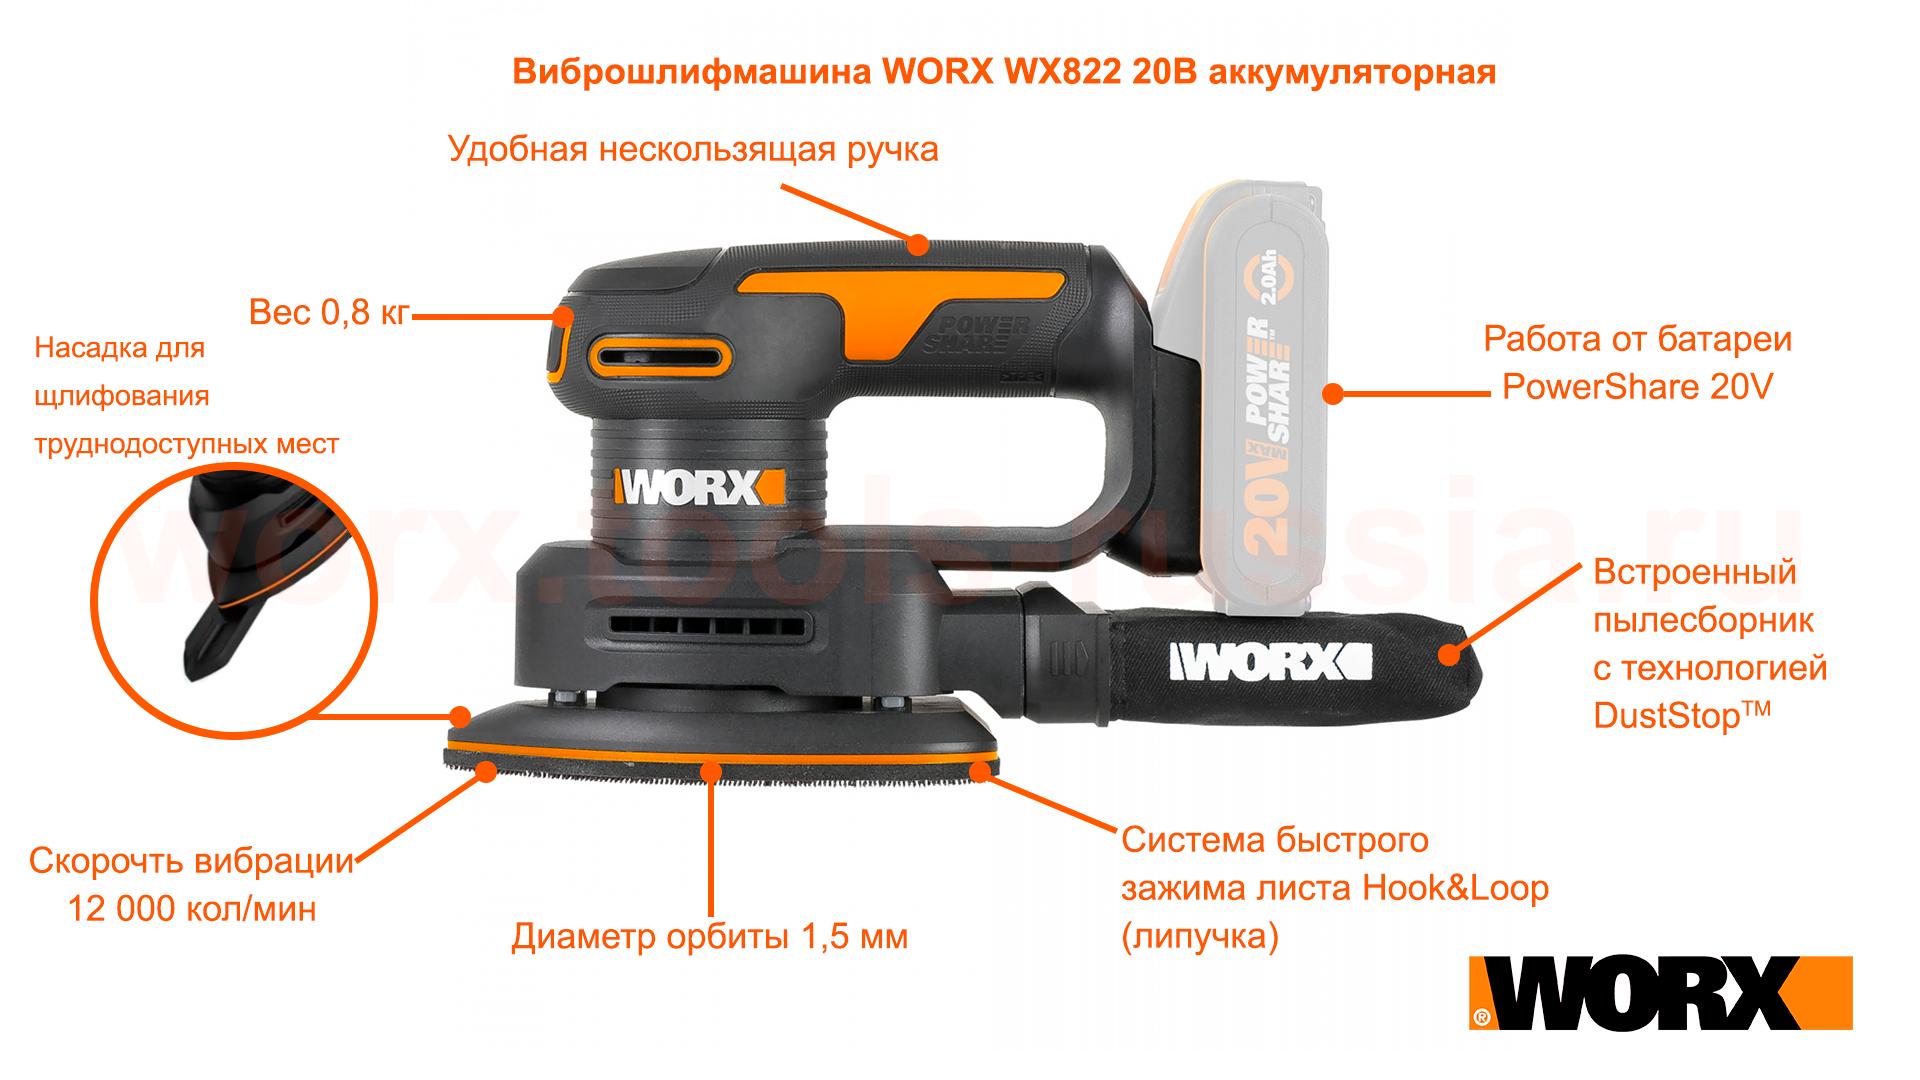 vibroshlifmashina-worx-wx822-20v-akkumulyatornaya.png